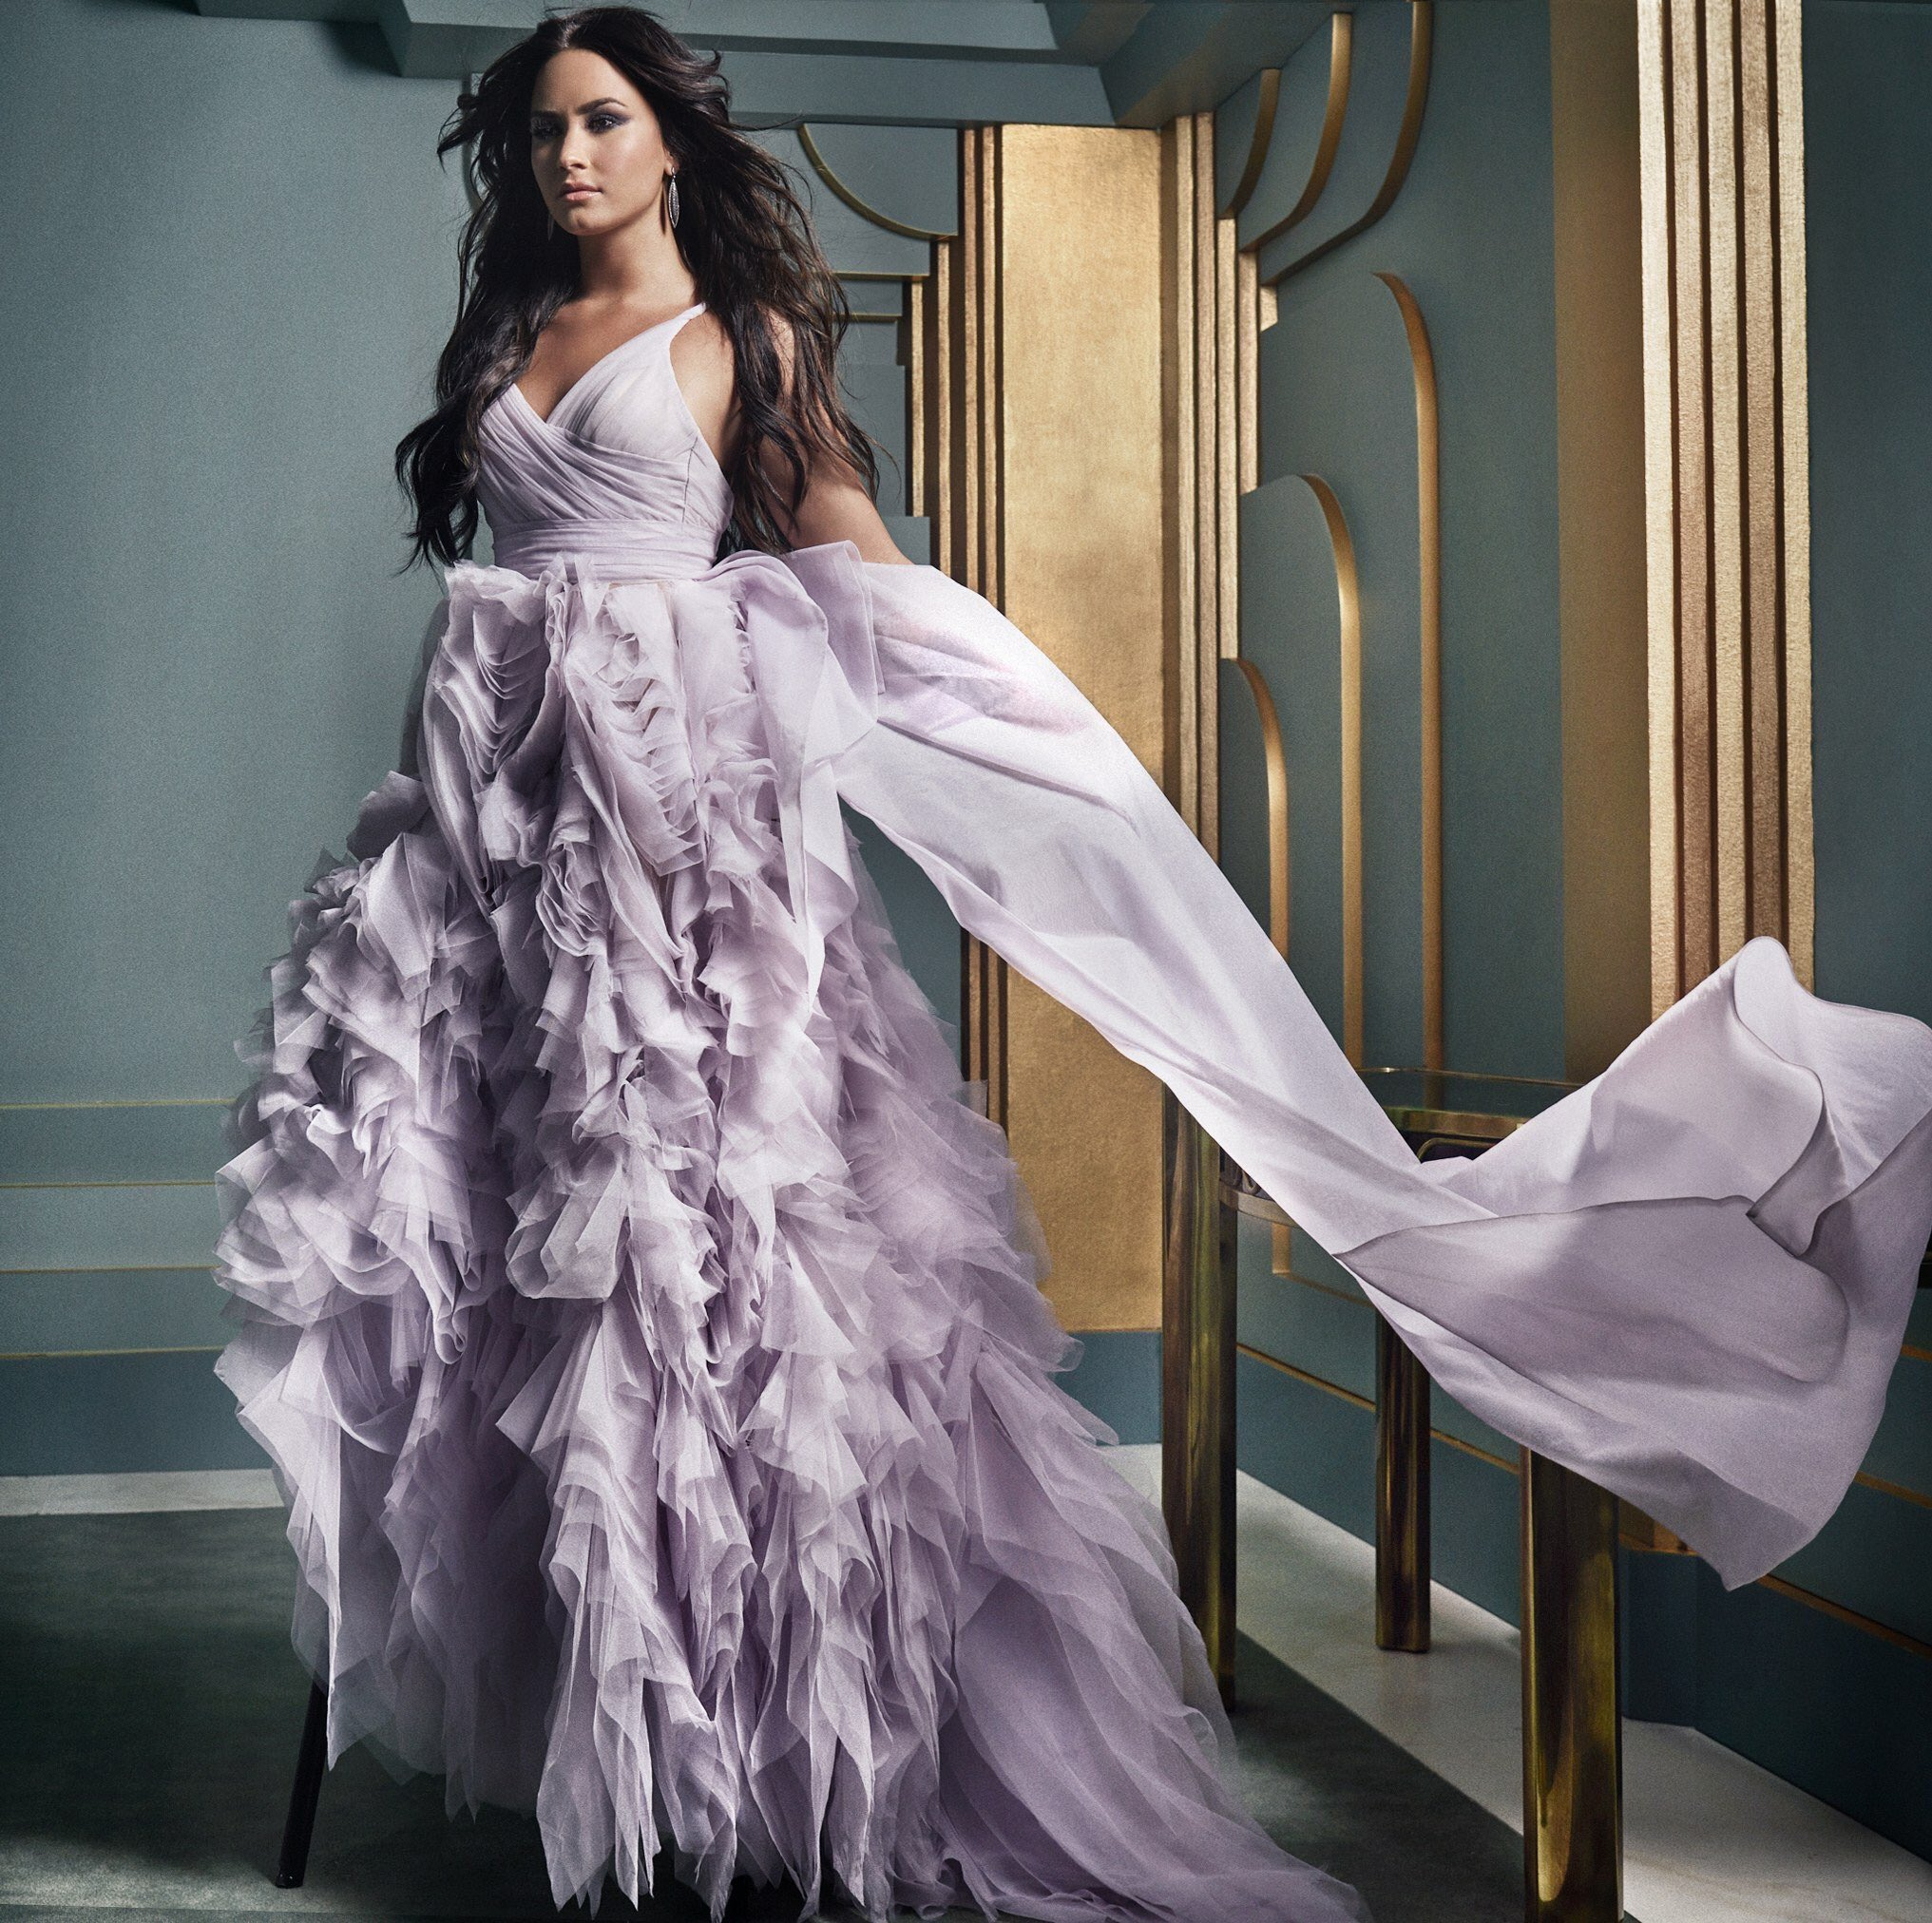 celeb news] Demi Lovato looking like a goddess for Vanity Fair OP ...